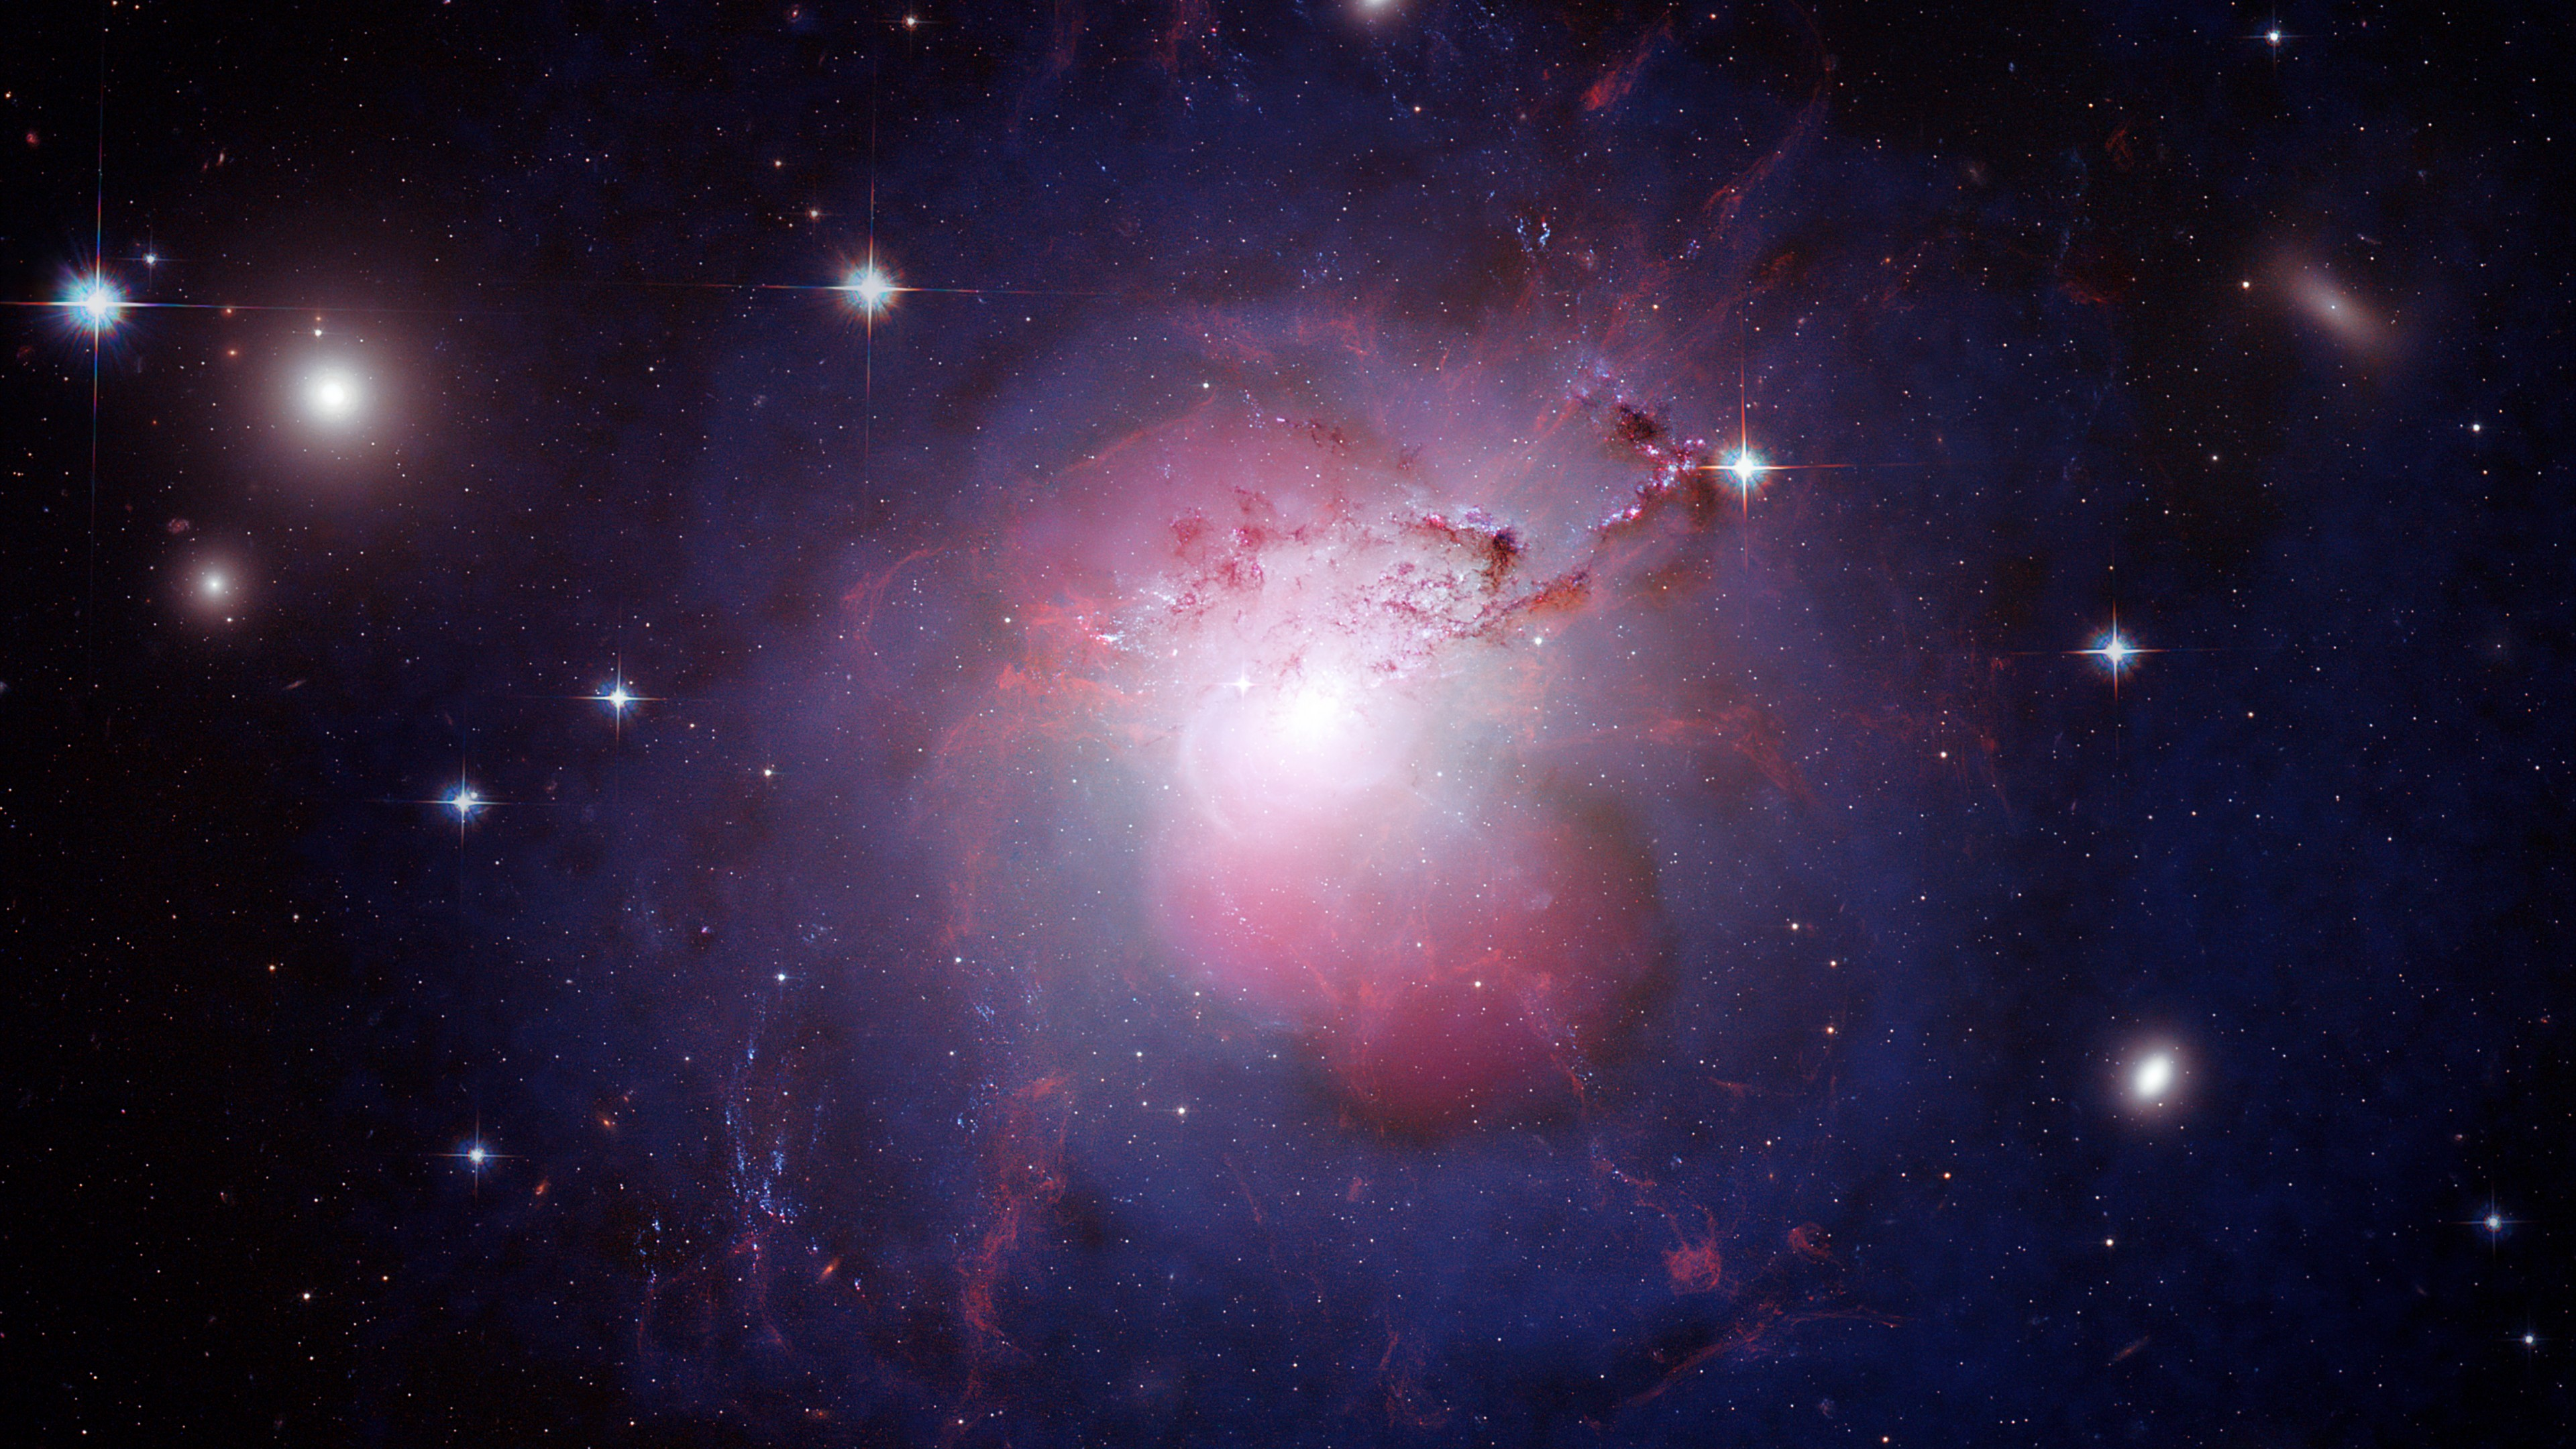 4k Galaxy Wallpaper 62 Images: Wallpaper Nebula, Stars, Space, Galaxy, Space #5414